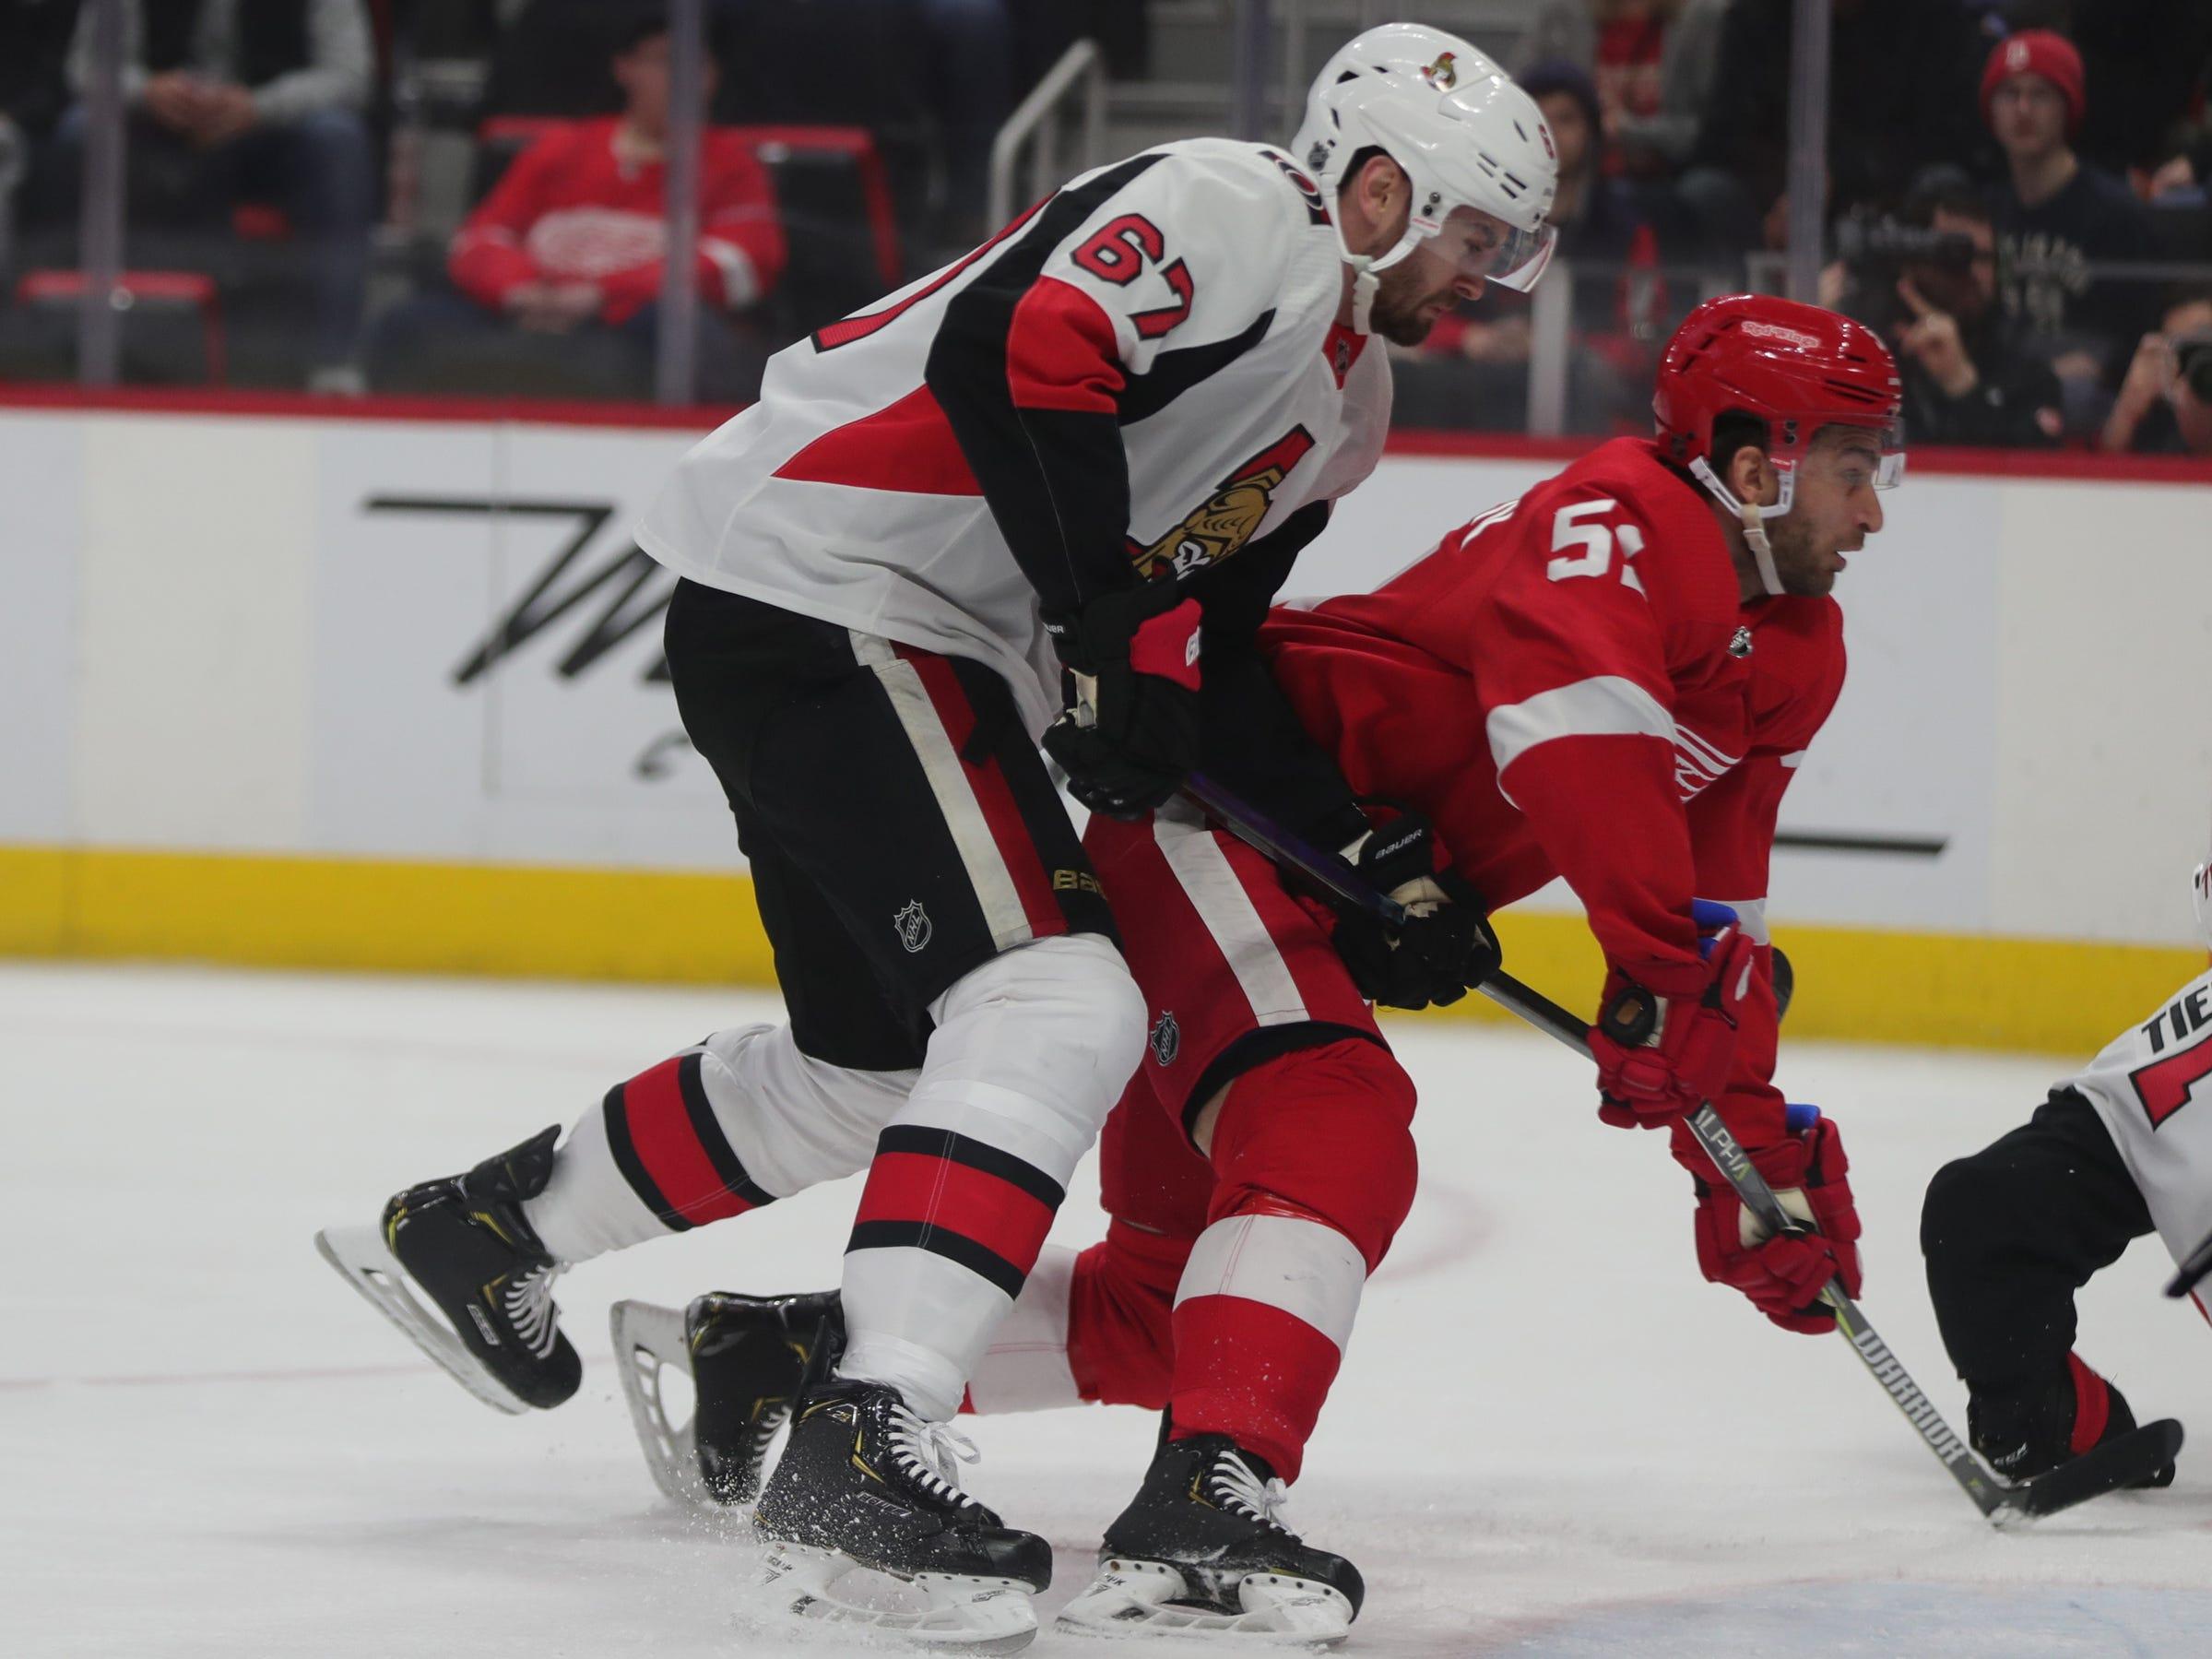 Red Wings defenseman Jonathan Ericsson is checked by Ottawa Senators defenseman Ben Harpur on Feb. 14, 2019 at Little Caesars Arena in Detroit.